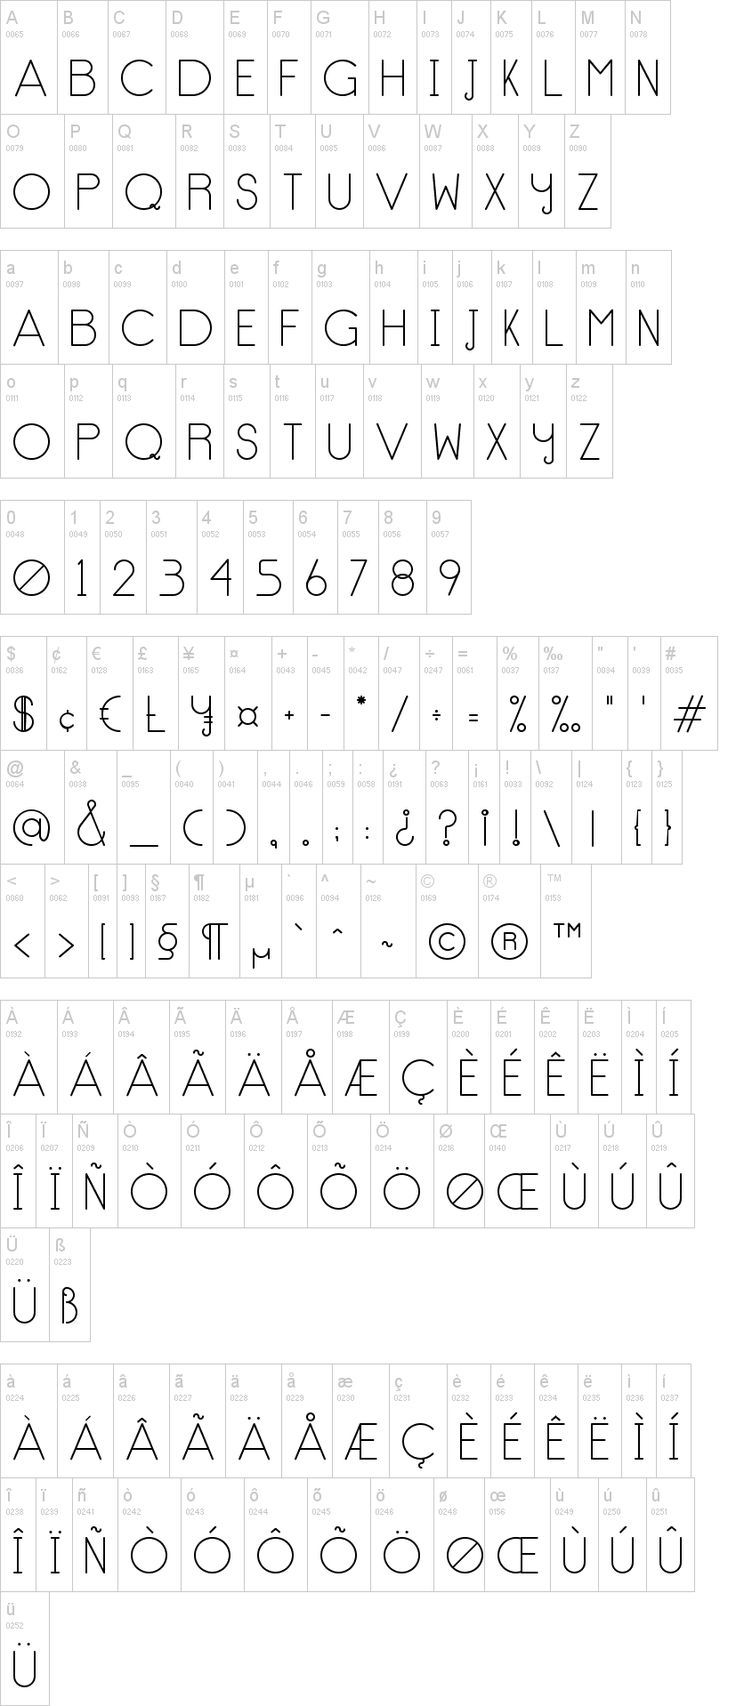 No Type Font | dafont.com   - Cool things - #cool #dafontcom #font #Type